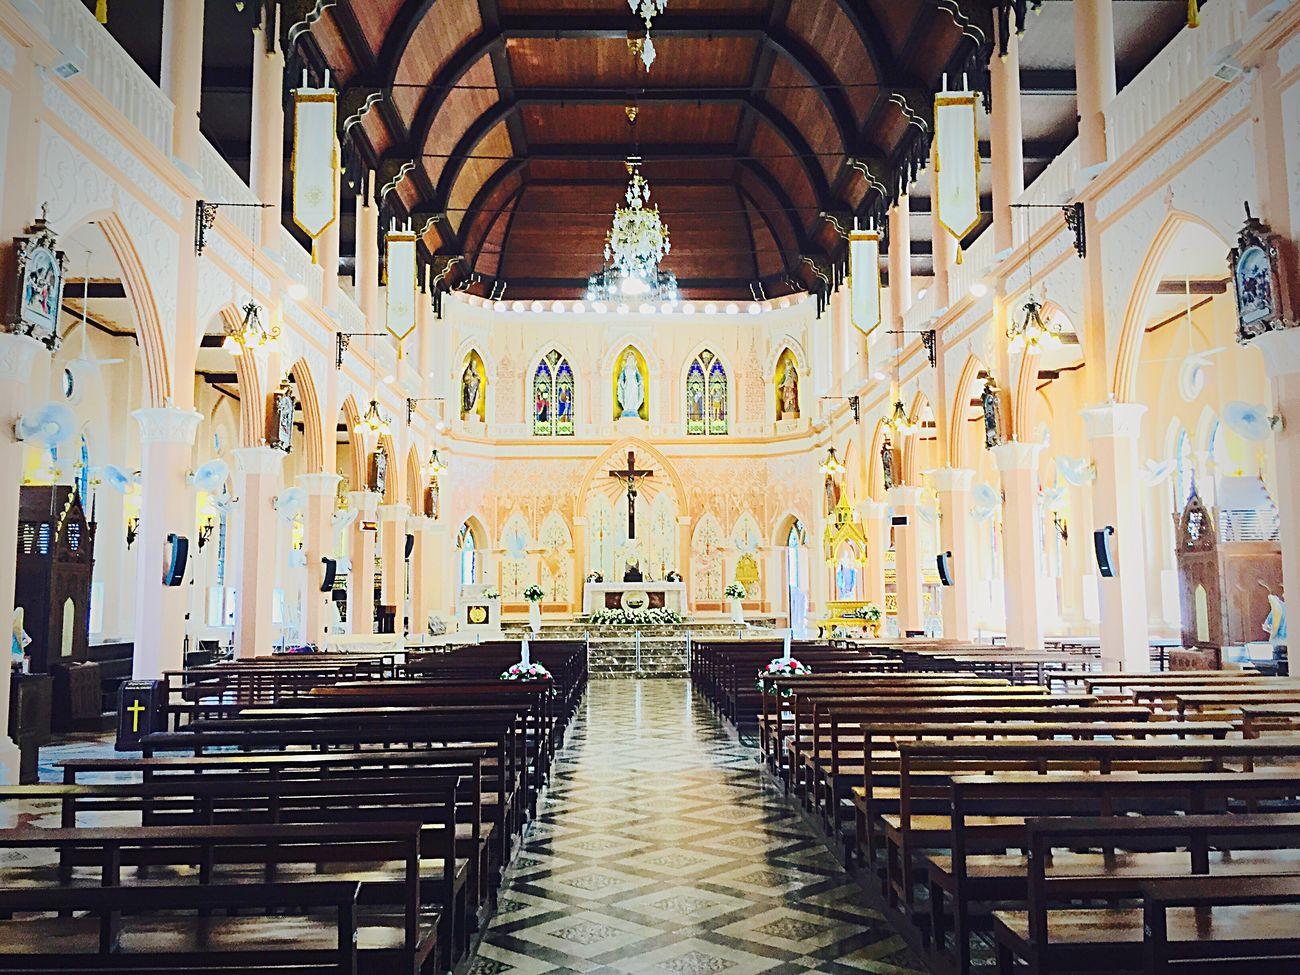 Church Inside EyeEm Best Shots EyeEmBestPics EyeEm Best Shots - Landscape EyeEm Best Shots - Architecture